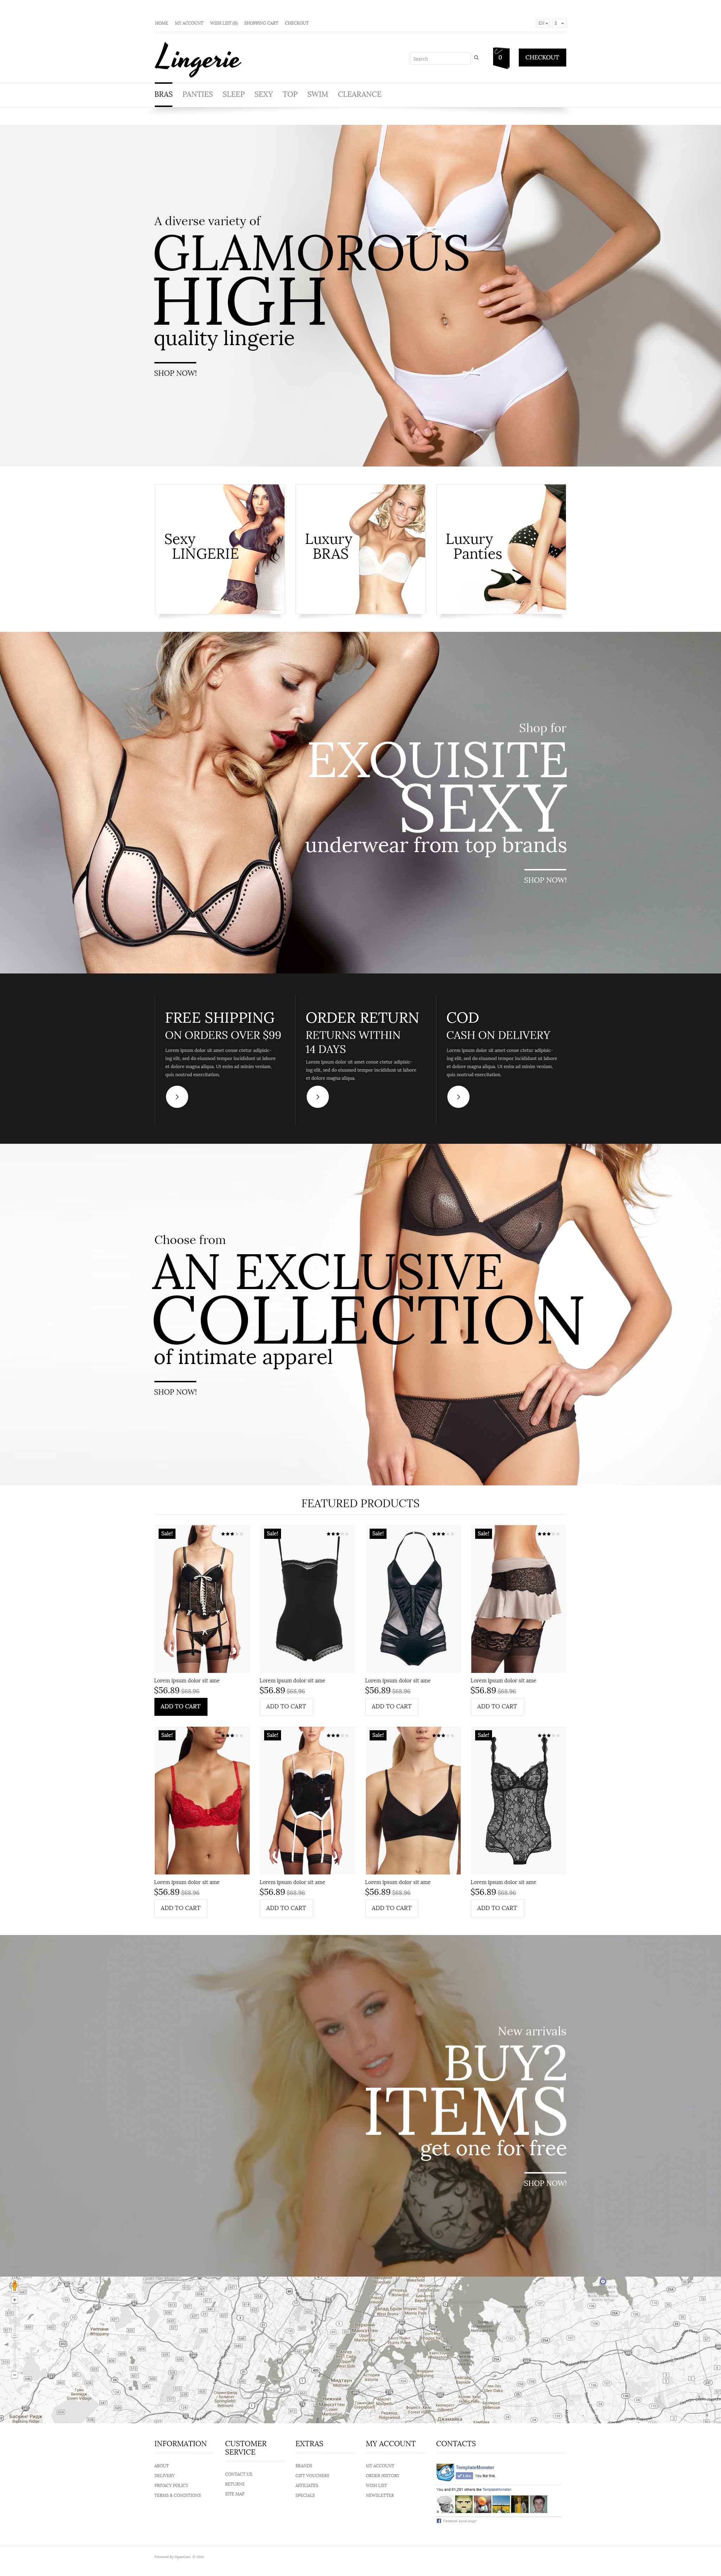 Lingerie Store OpenCart Template - screenshot